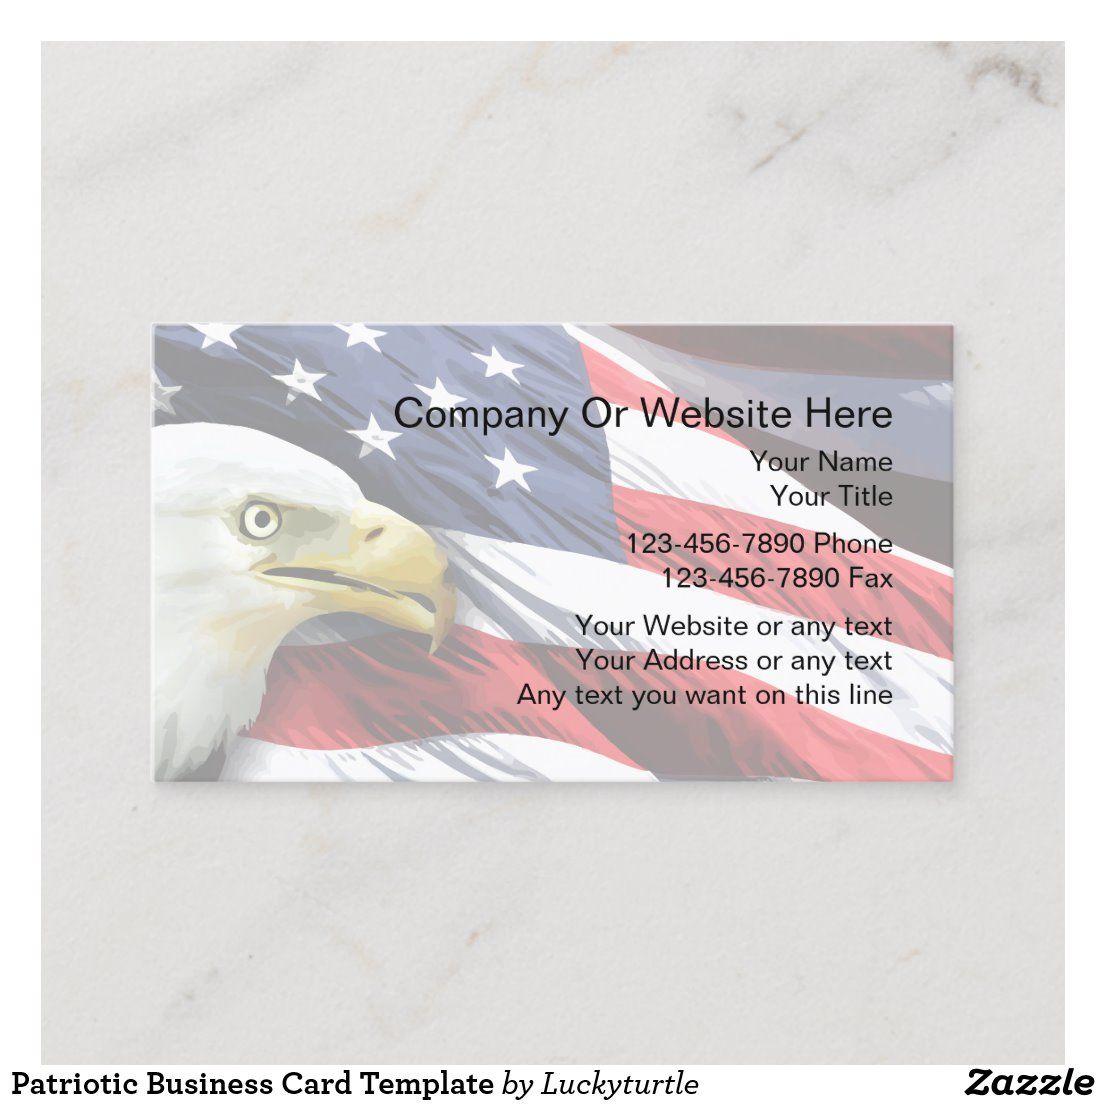 Patriotic Business Card Template Zazzle Com Business Card Template Free Business Card Templates Card Template